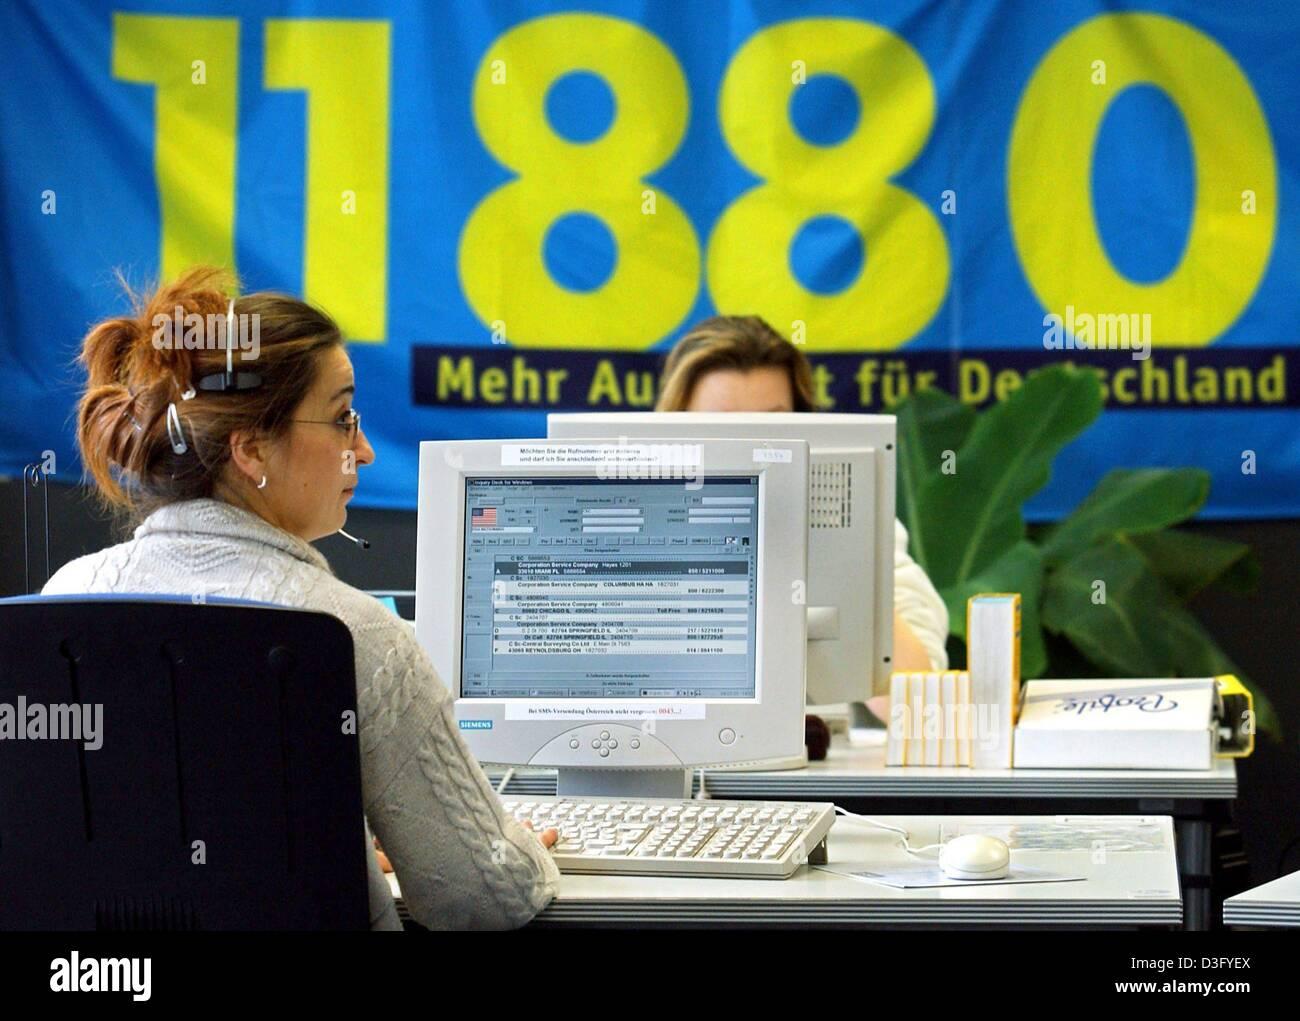 Wann Telefonnummern online datieren jehovah Zeuge Online-Dating-Seiten